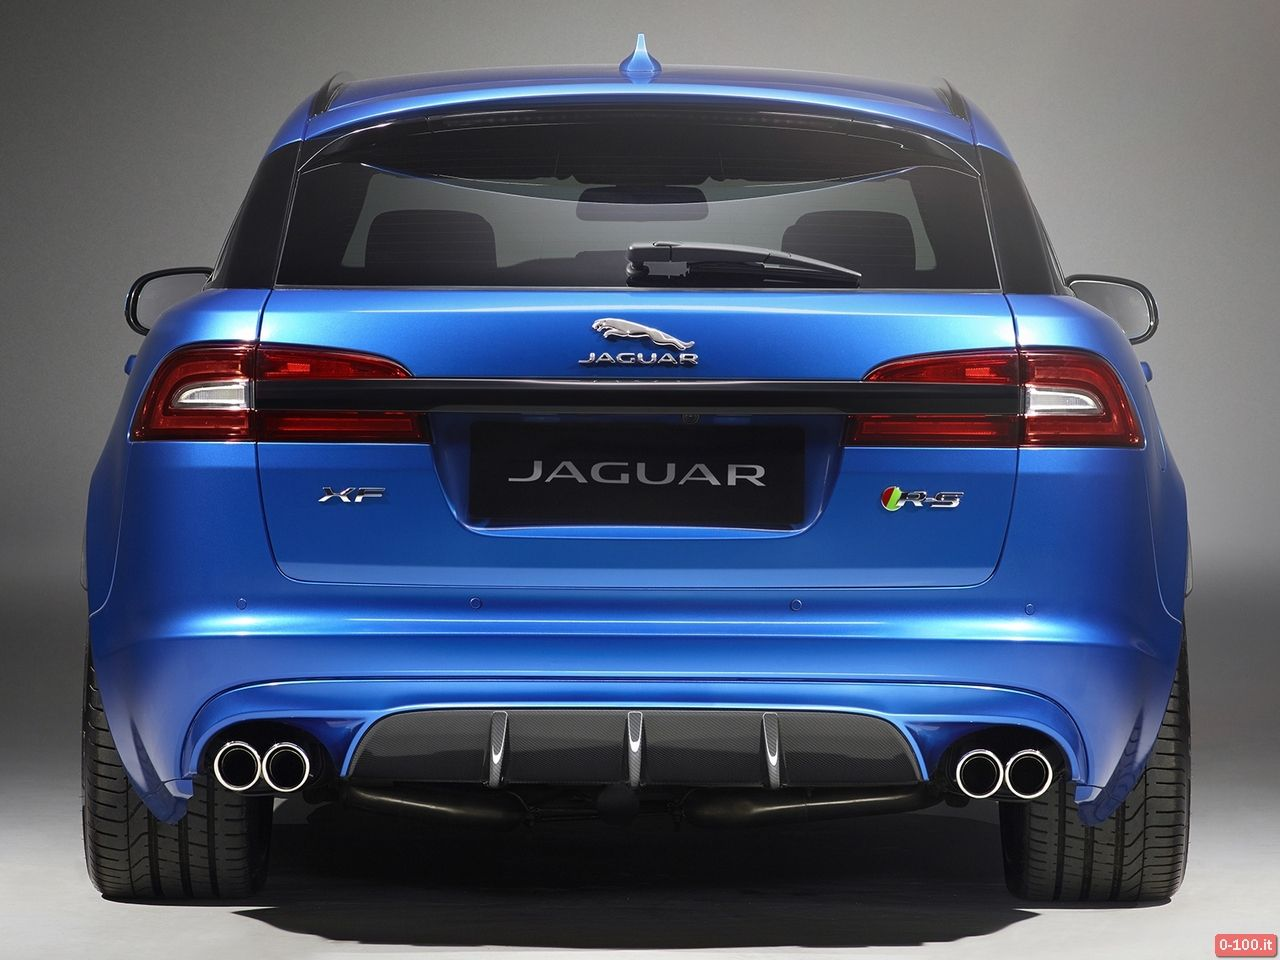 ginevra-2014-jaguar-xf-model-year-2015-xfr-s-sportbrake-0-100_6